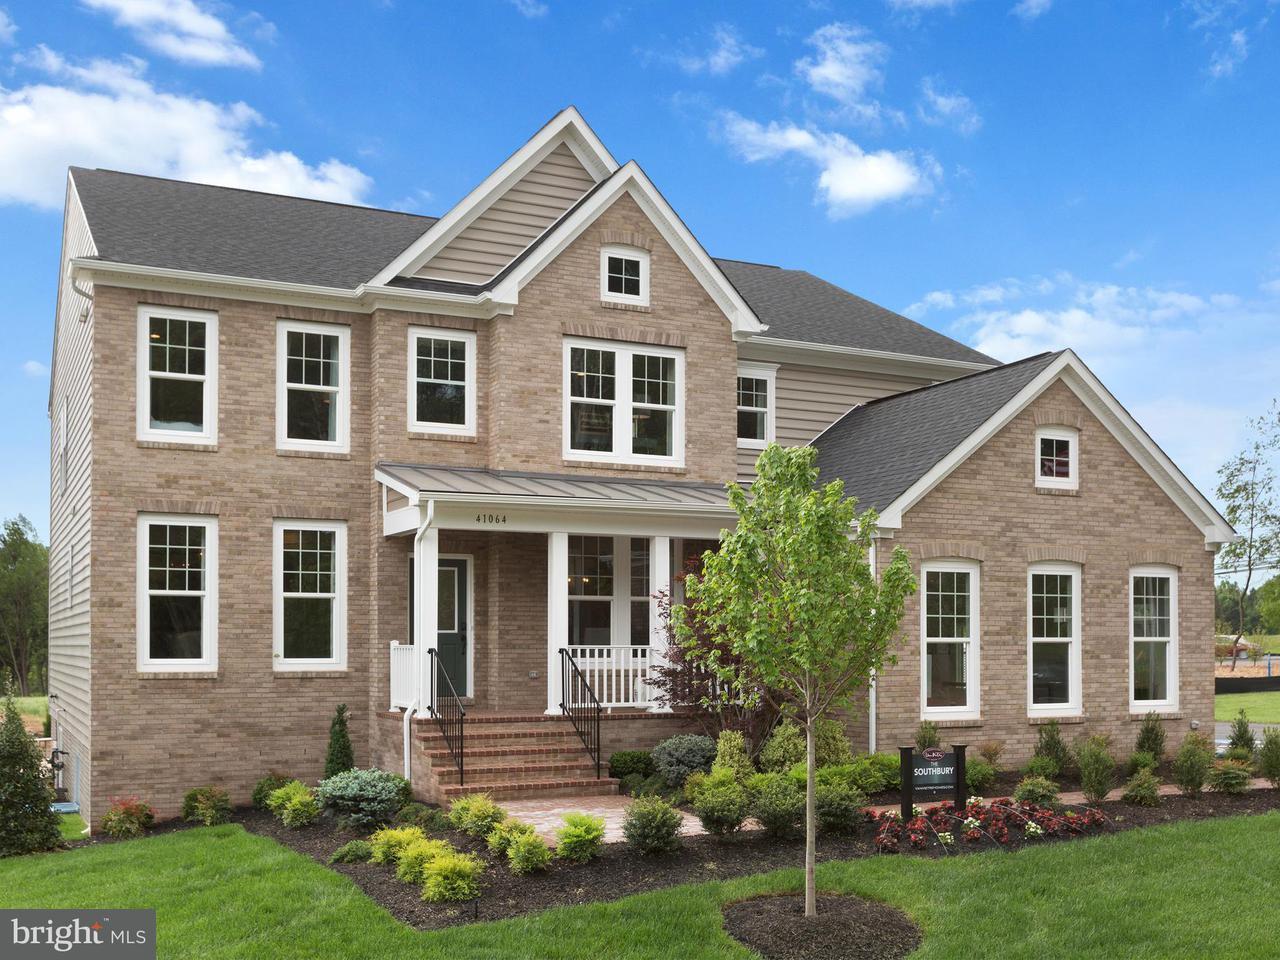 Single Family Home for Sale at 41064 MAPLEHURST Drive 41064 MAPLEHURST Drive Aldie, Virginia 20105 United States